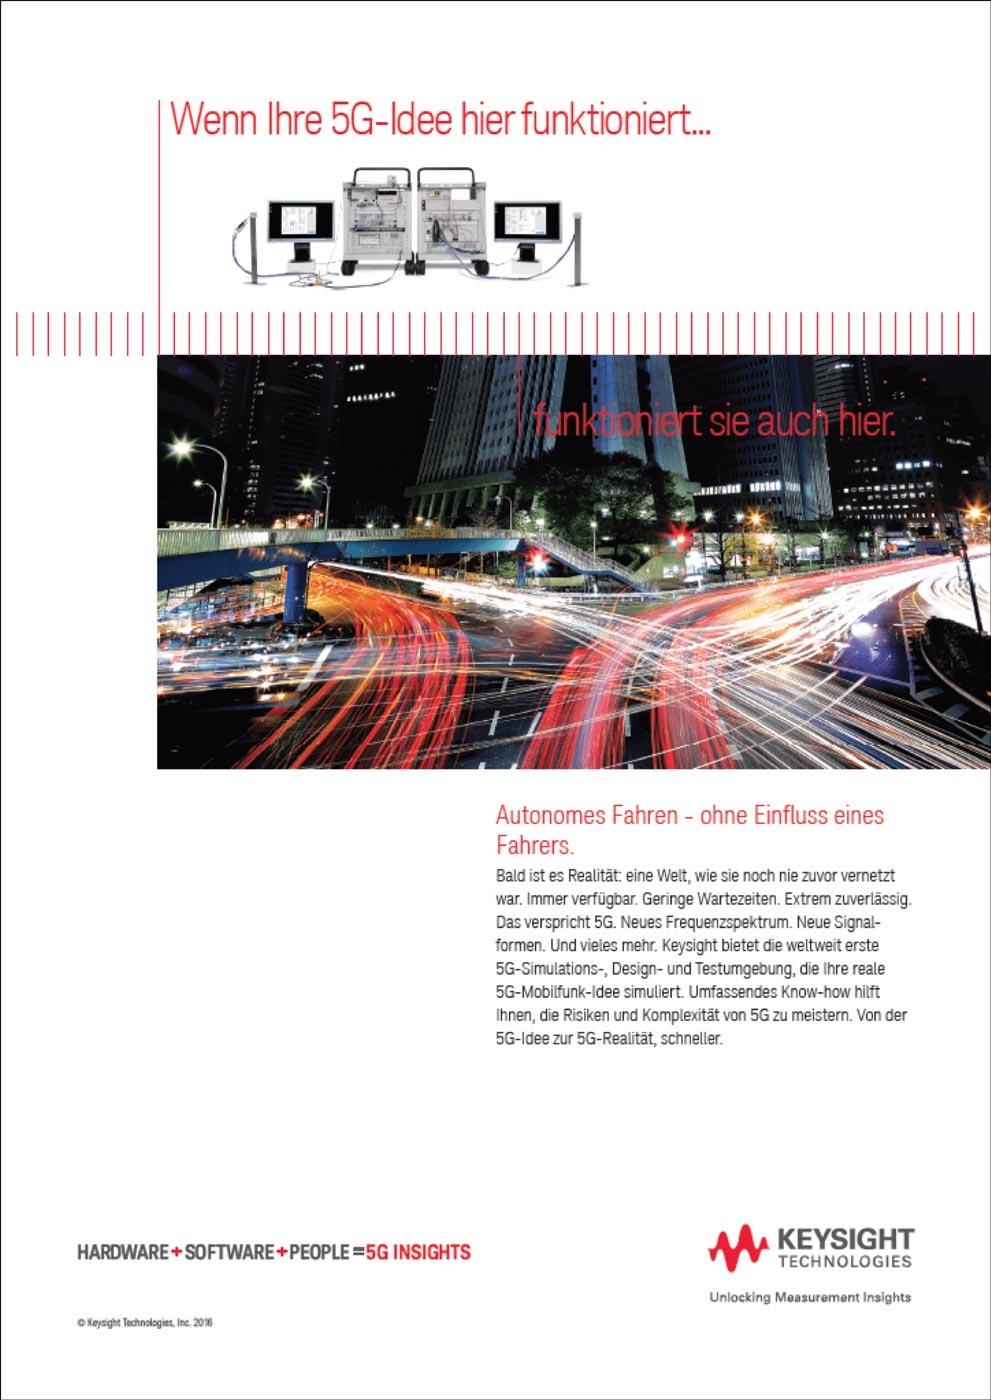 Keysight Technologies: 5G Campaign - Hydrogen Advertising